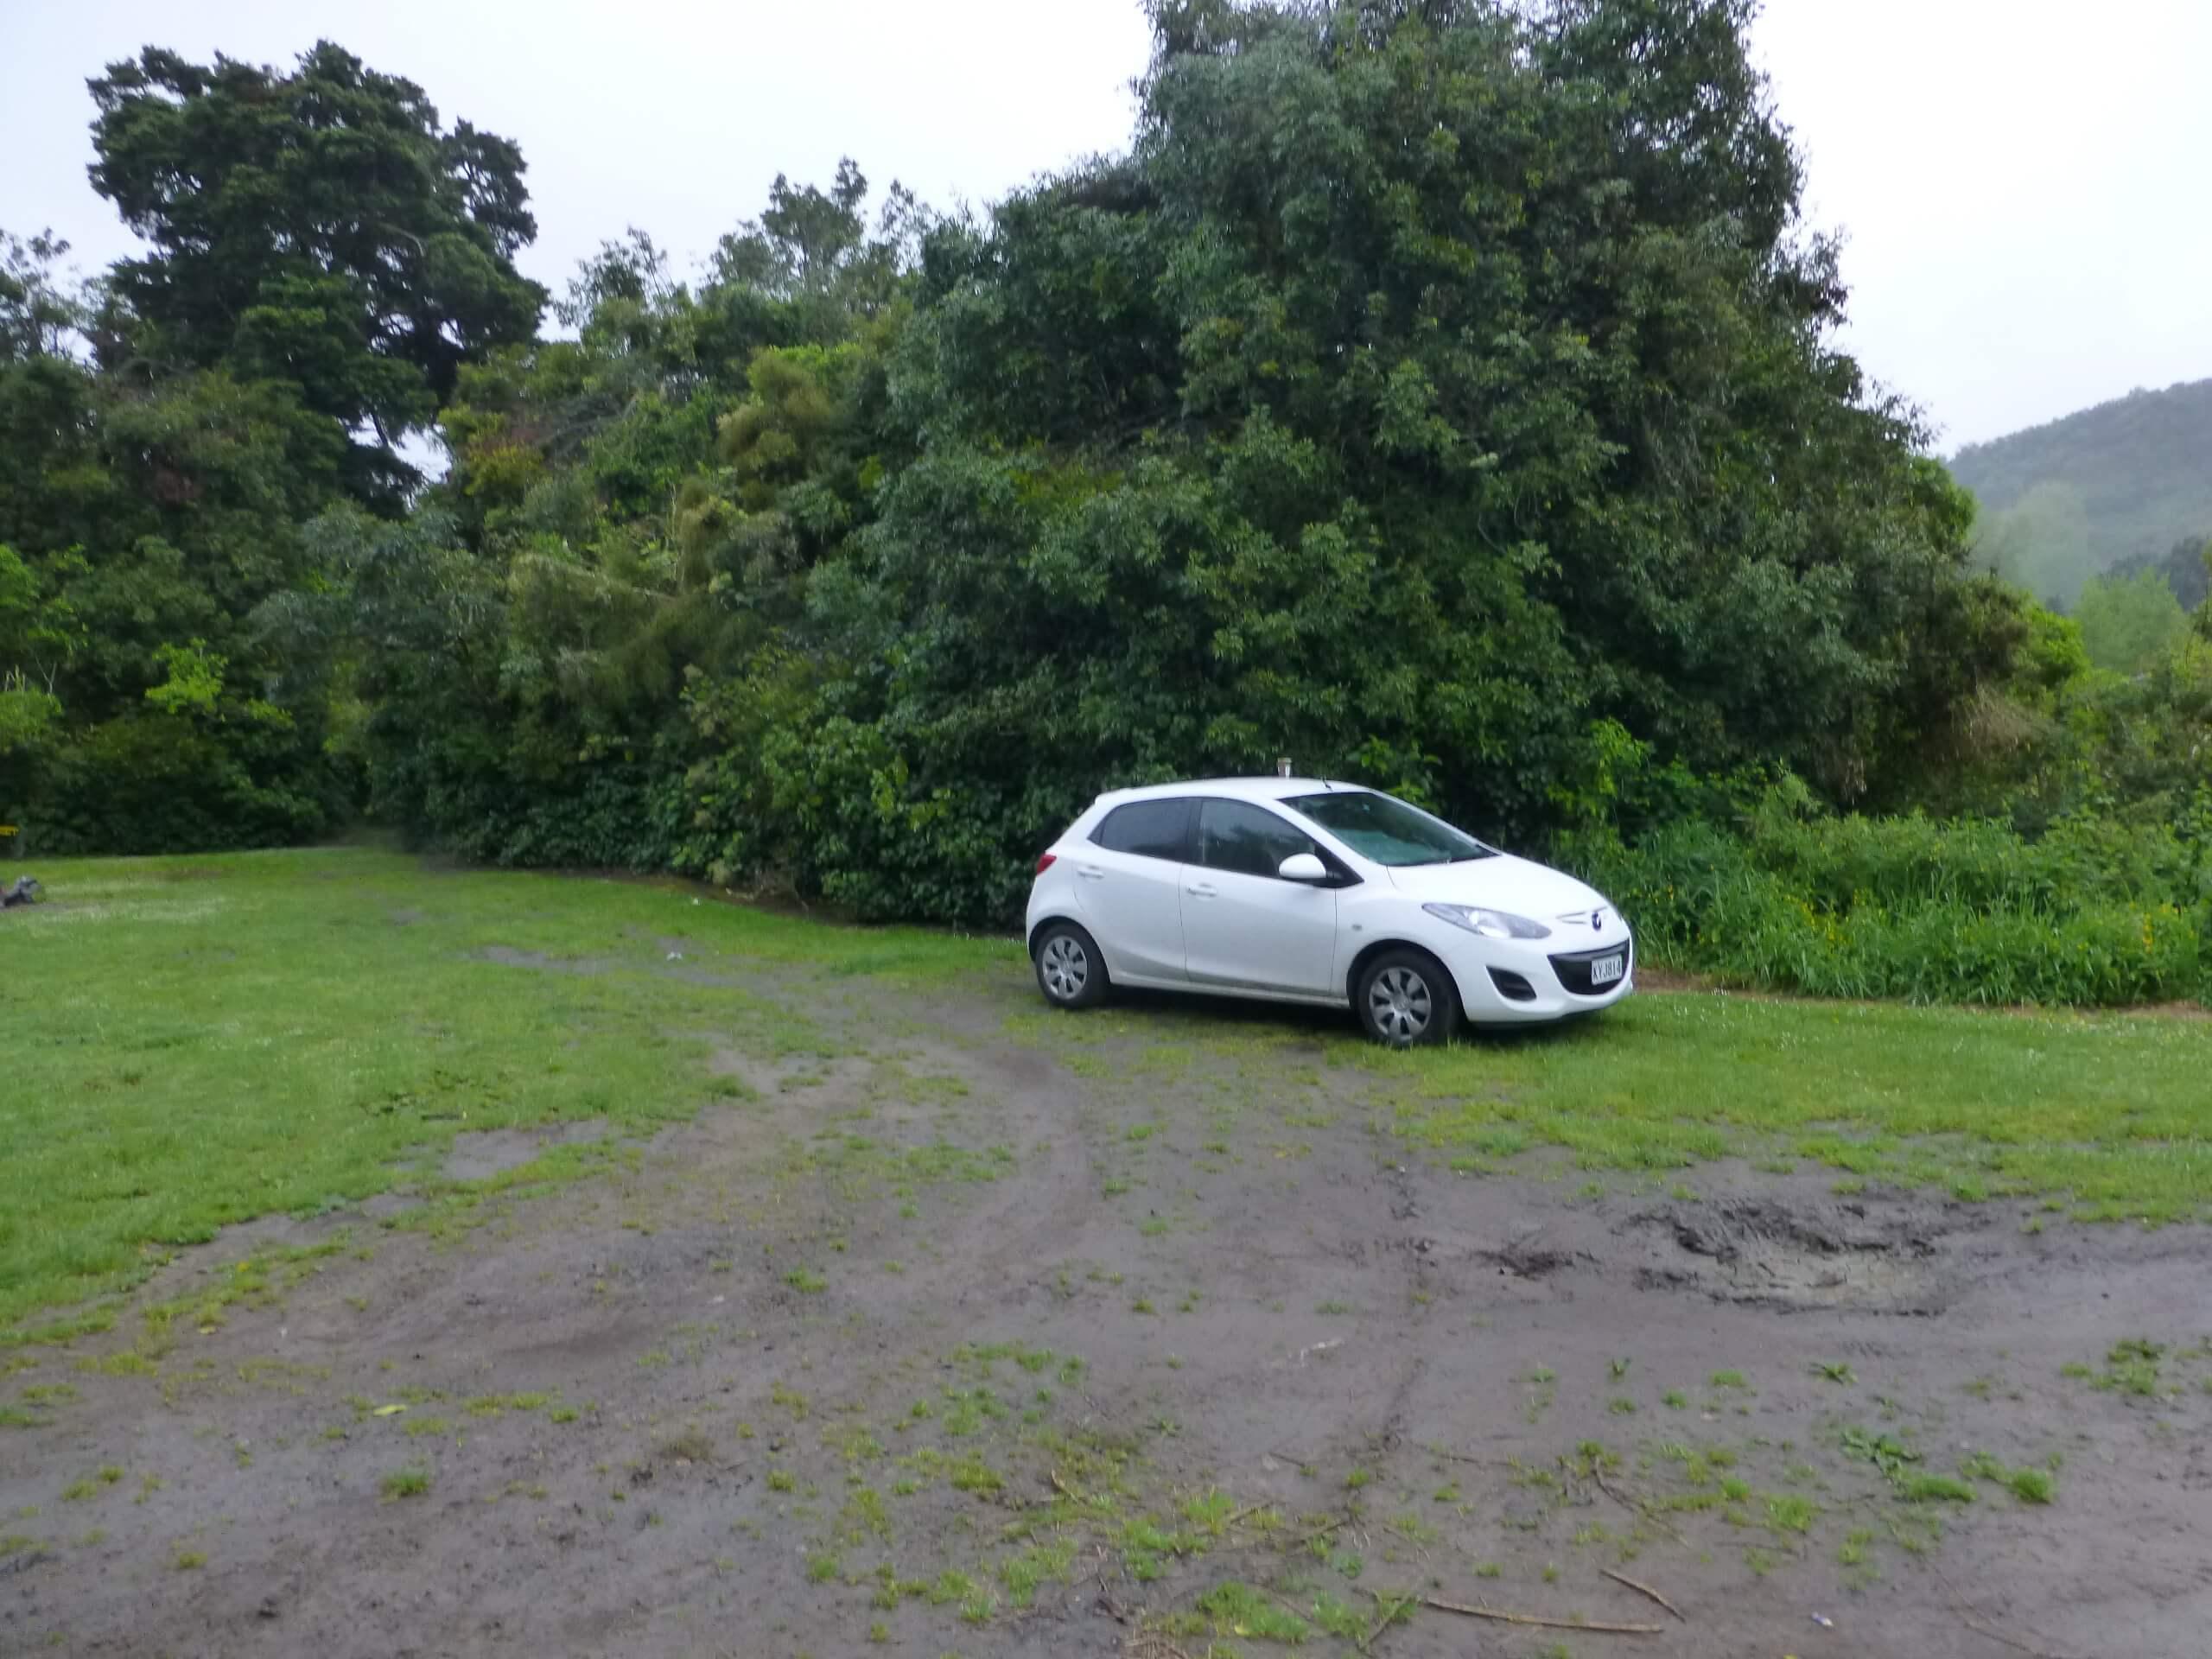 Campingplatz, PiriPiri 4, Weit weg reisen